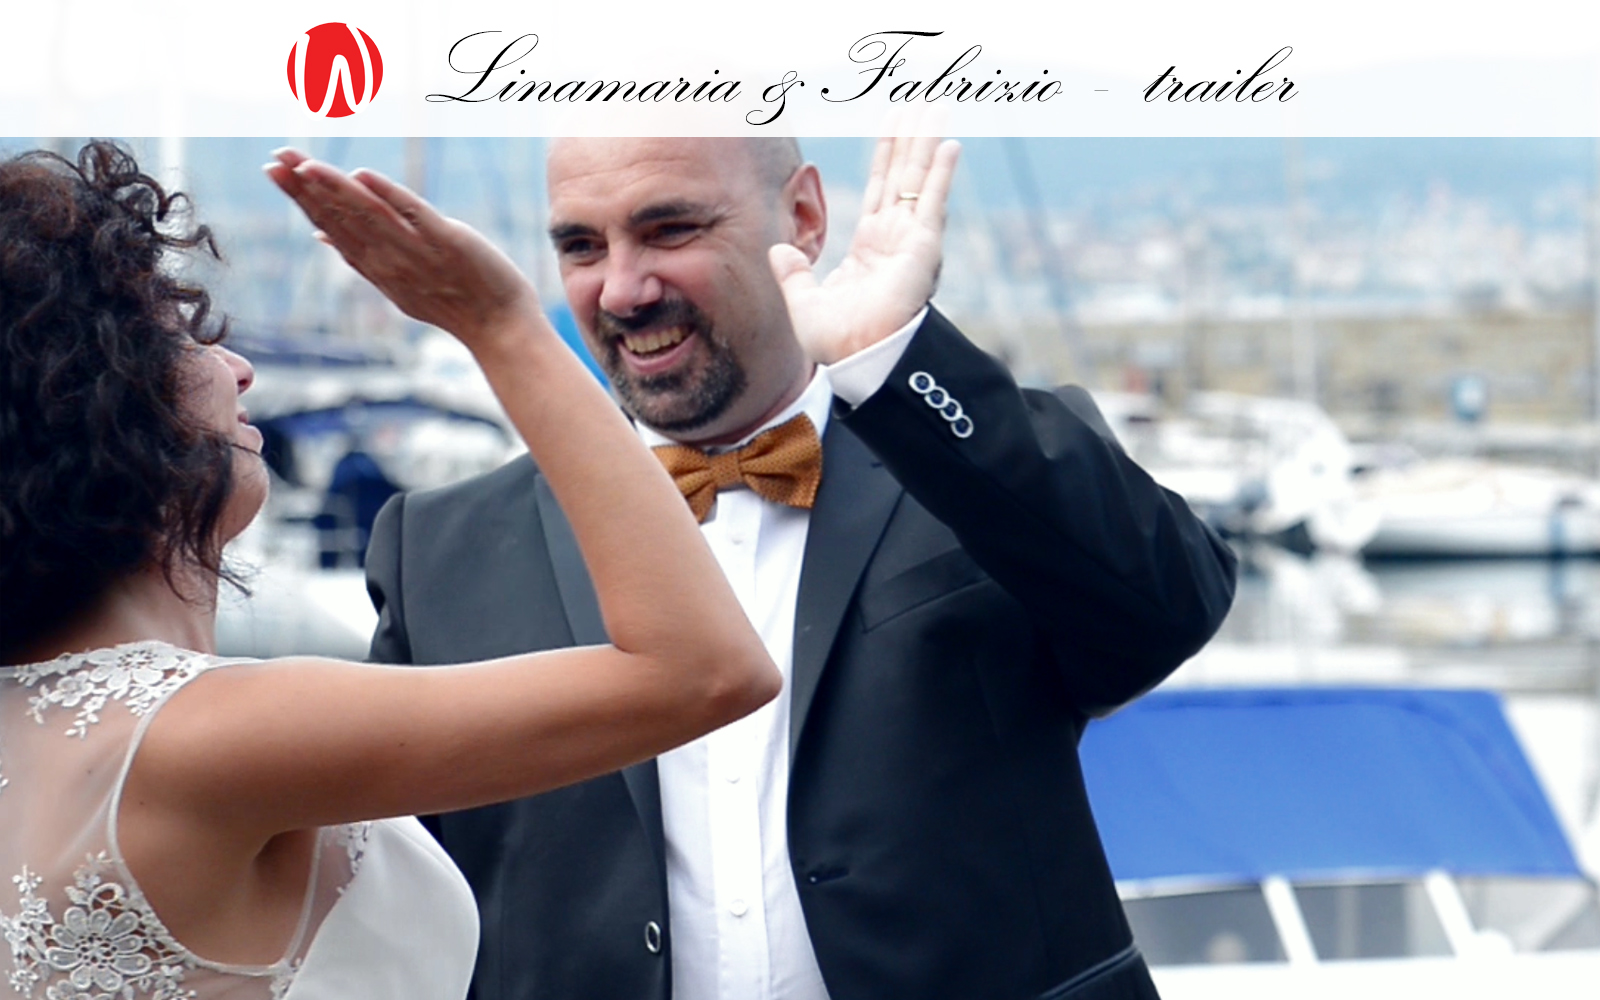 Linamaria & Fabrizio